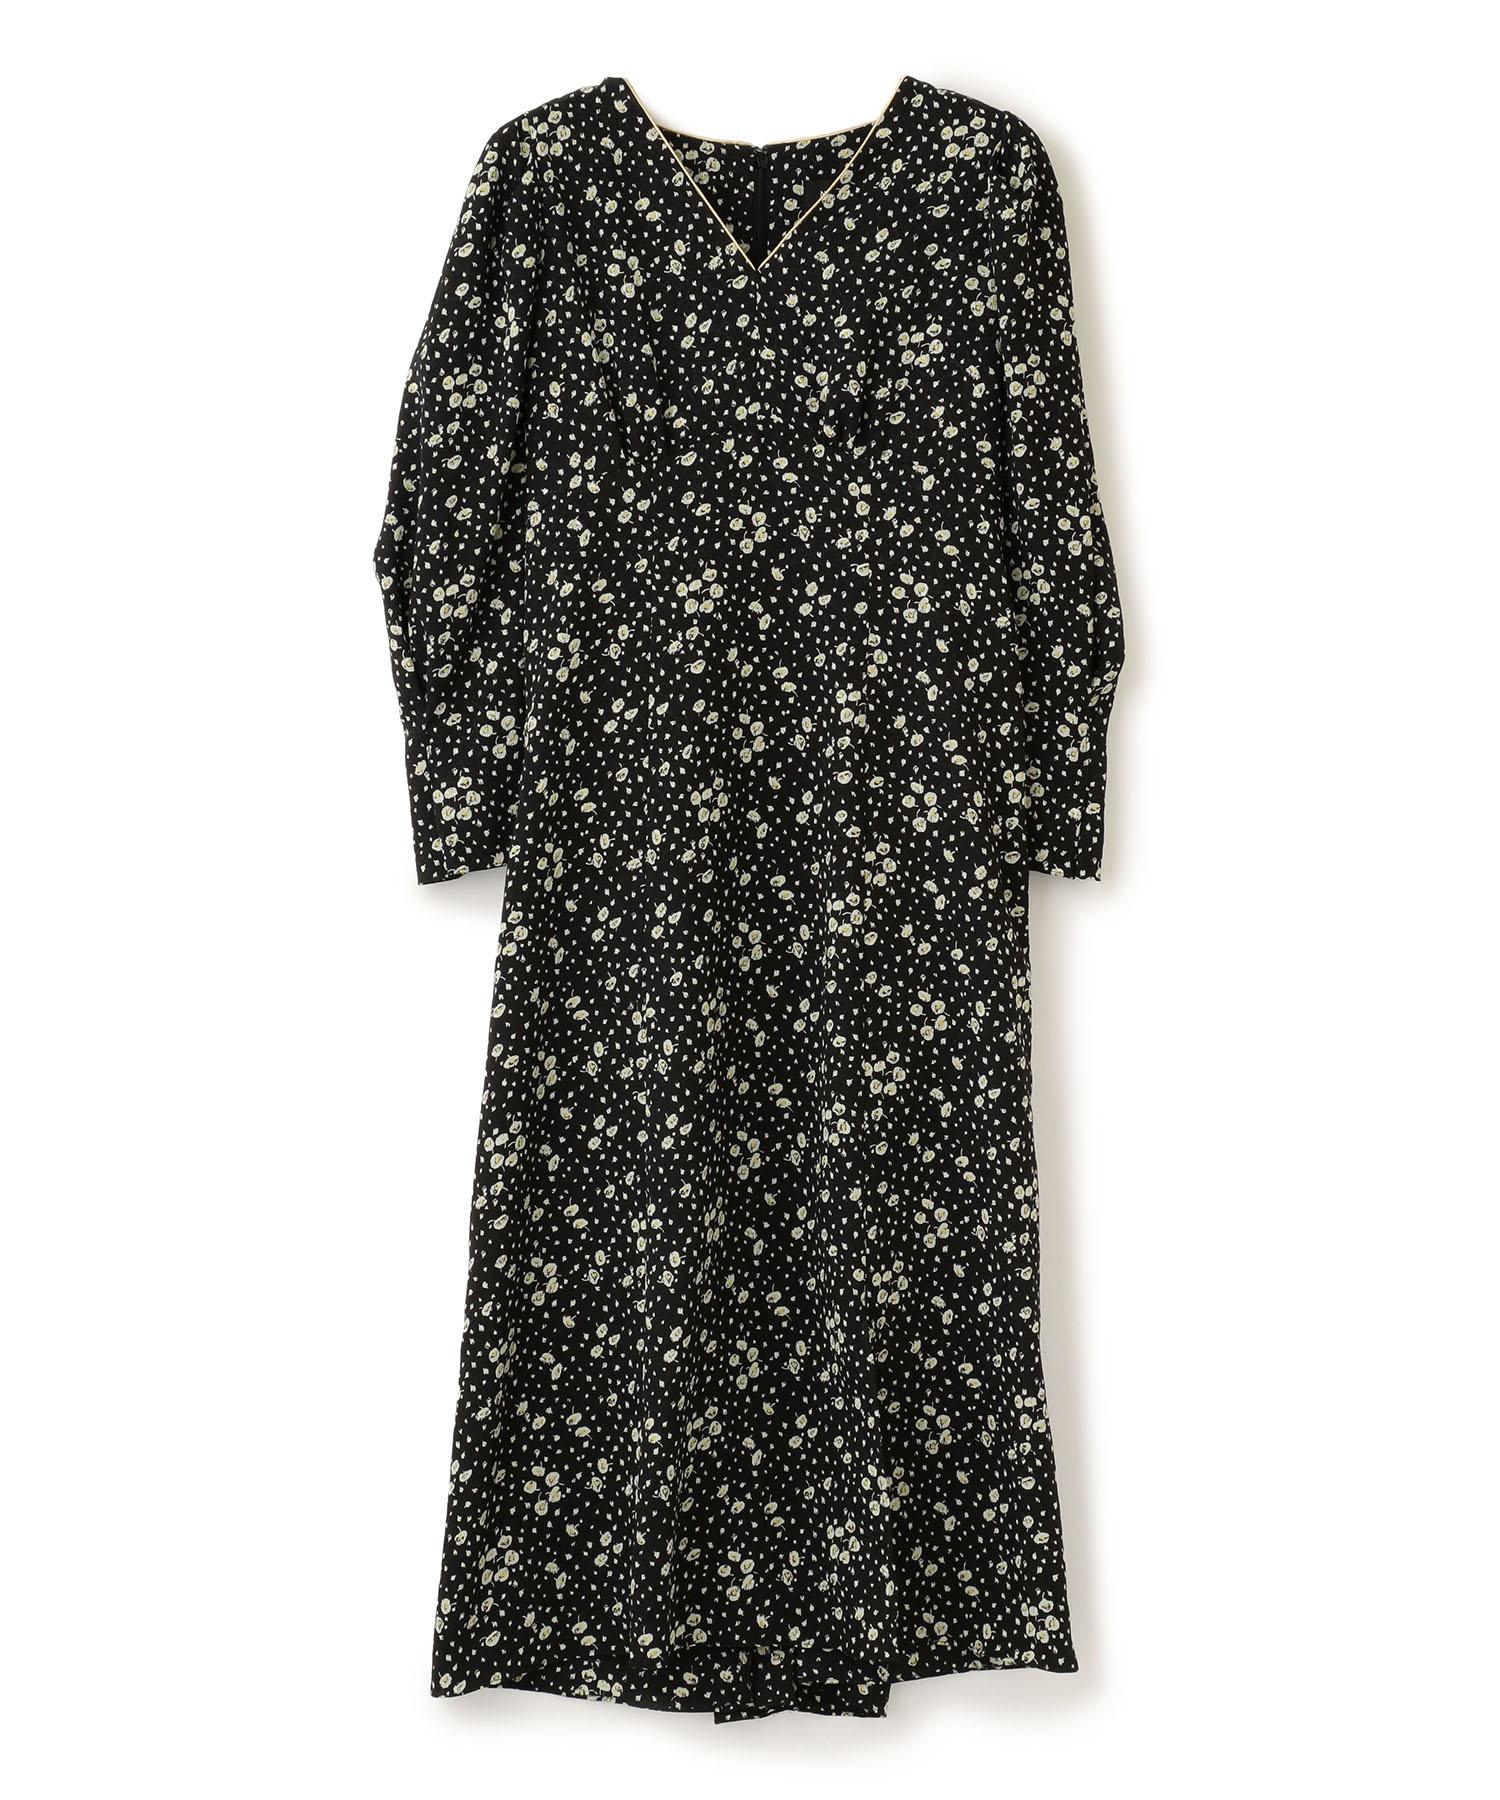 Crepe Flower Print Dress